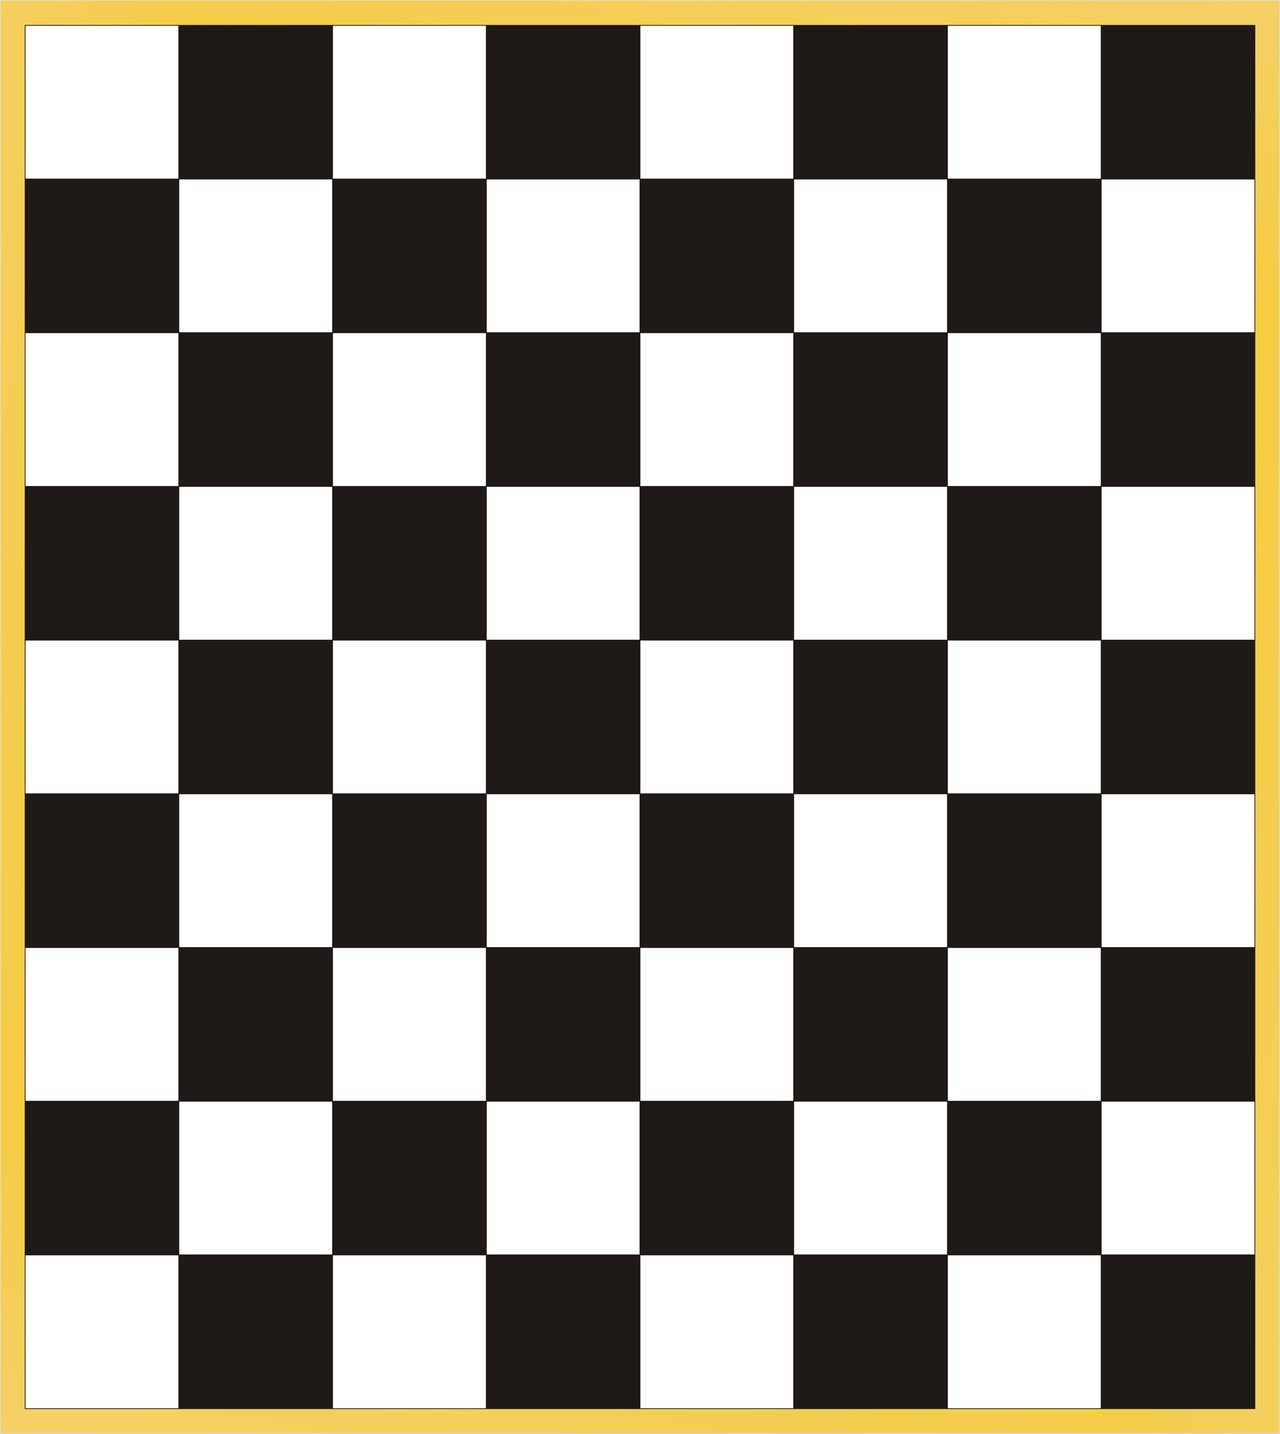 Clipart chess board.